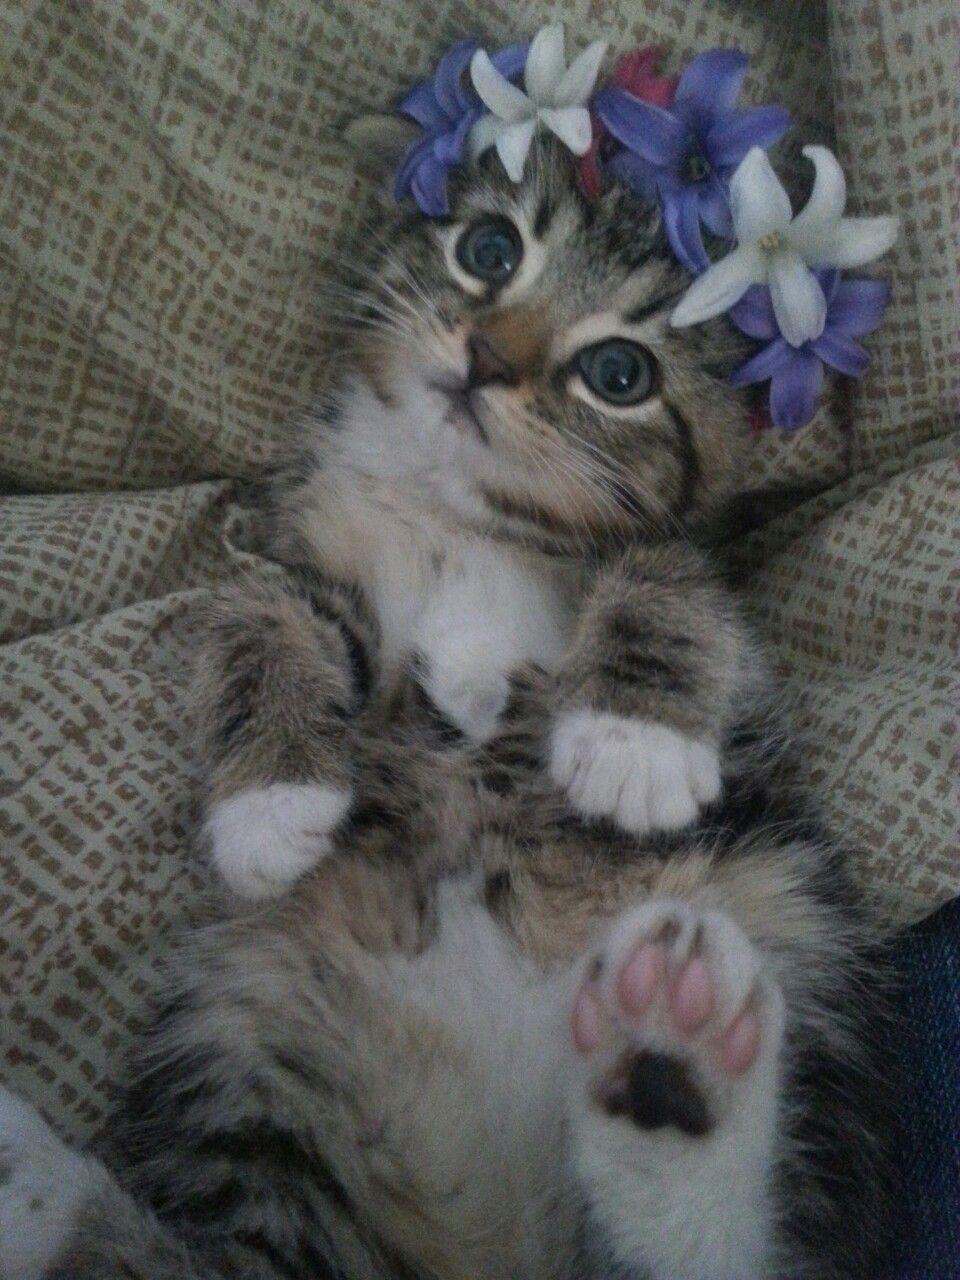 Pin By Paola Gonzlez On Animales Que Me Encantan Pinterest Cat